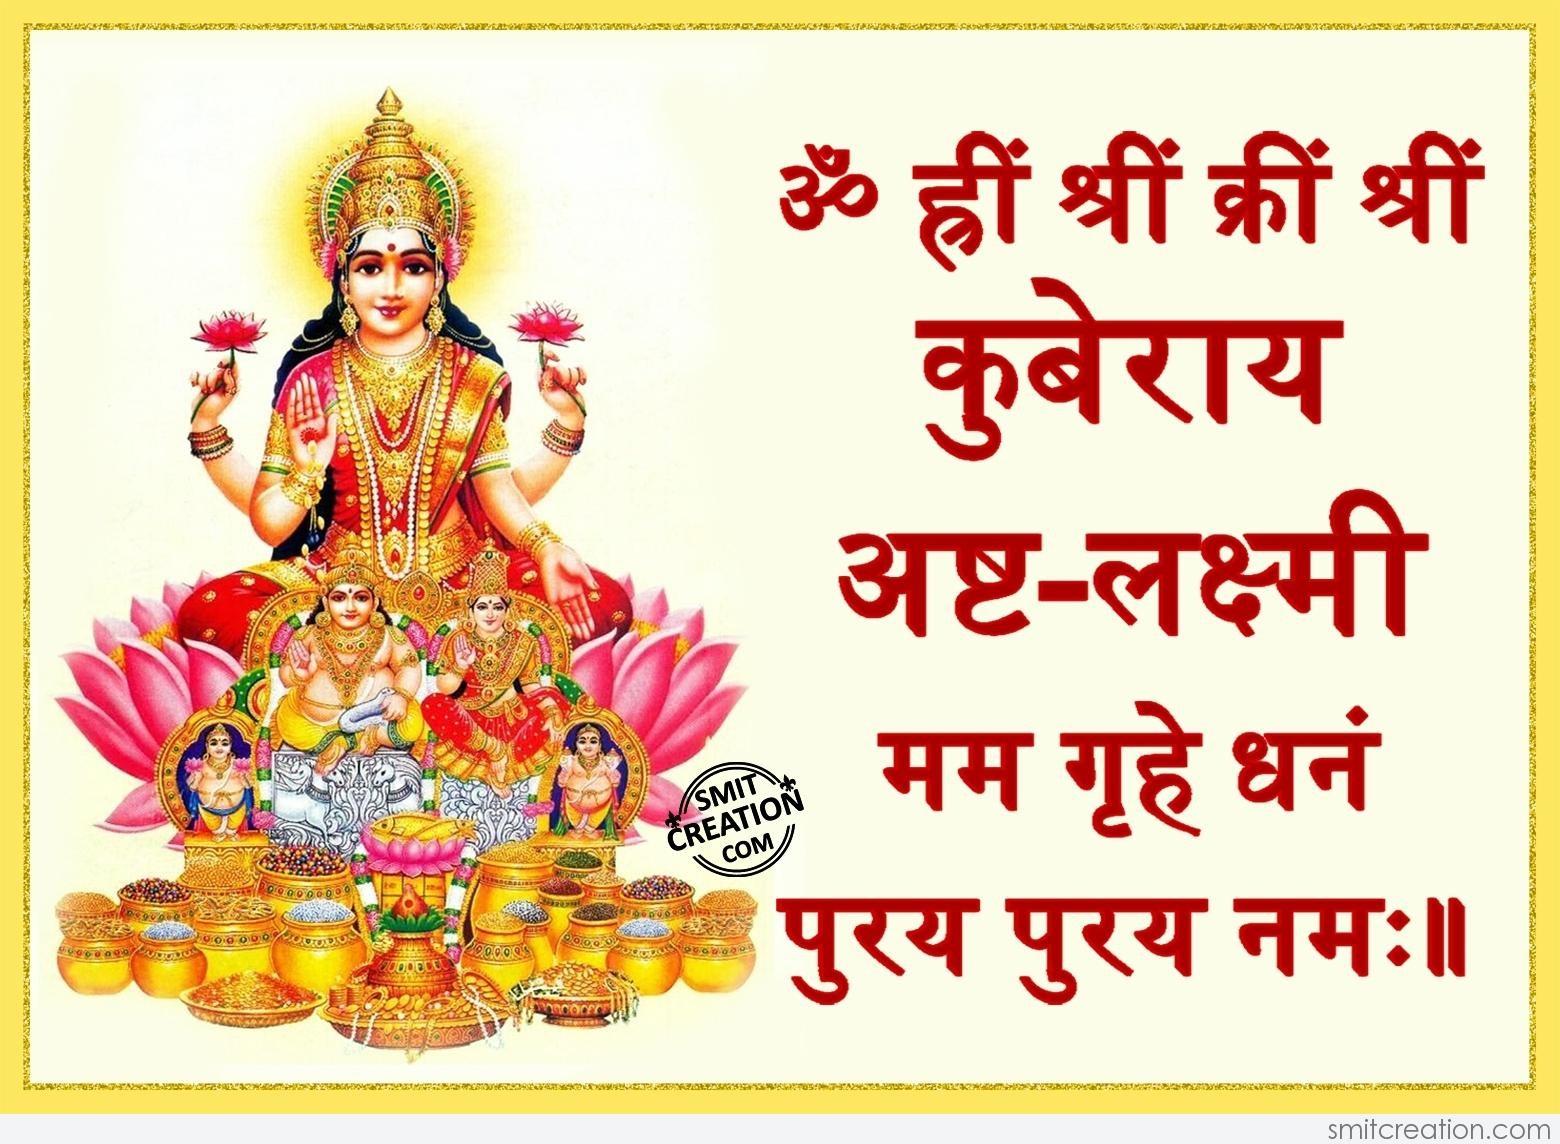 Aarti 3d Name Wallpaper Kuber Laxmi Mantra Smitcreation Com